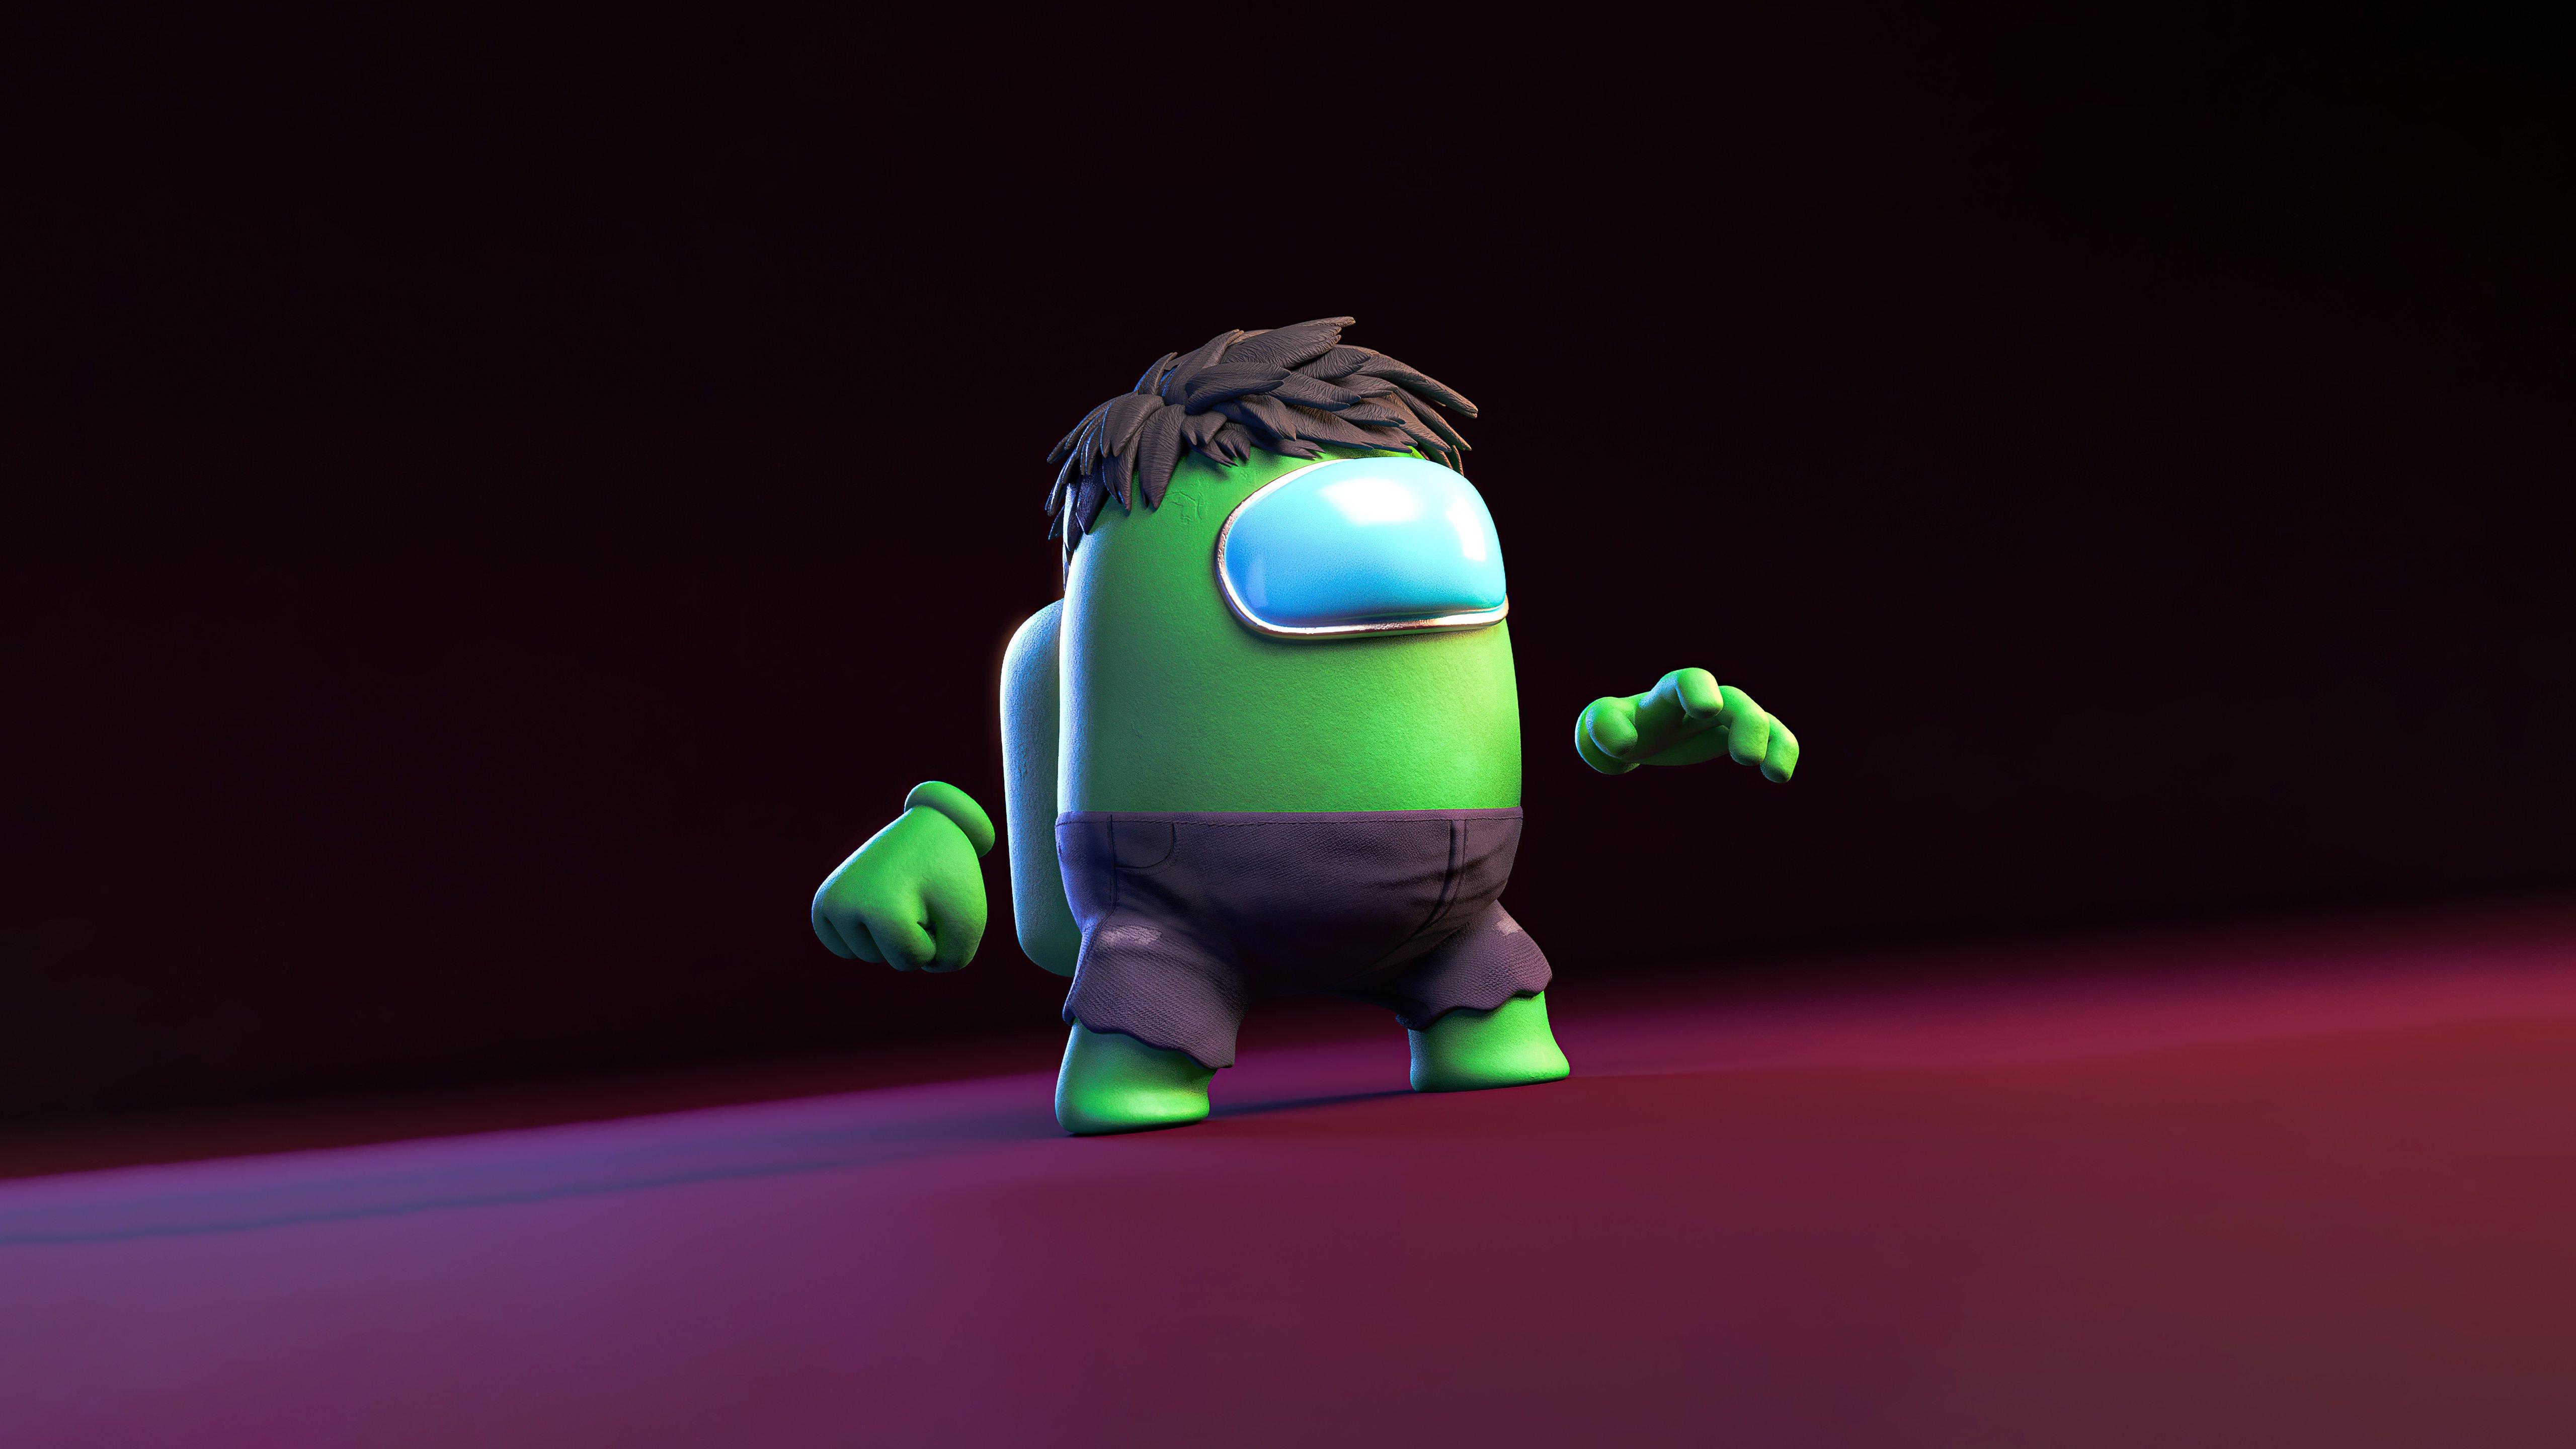 Fondos de pantalla Hulk estilo Among us